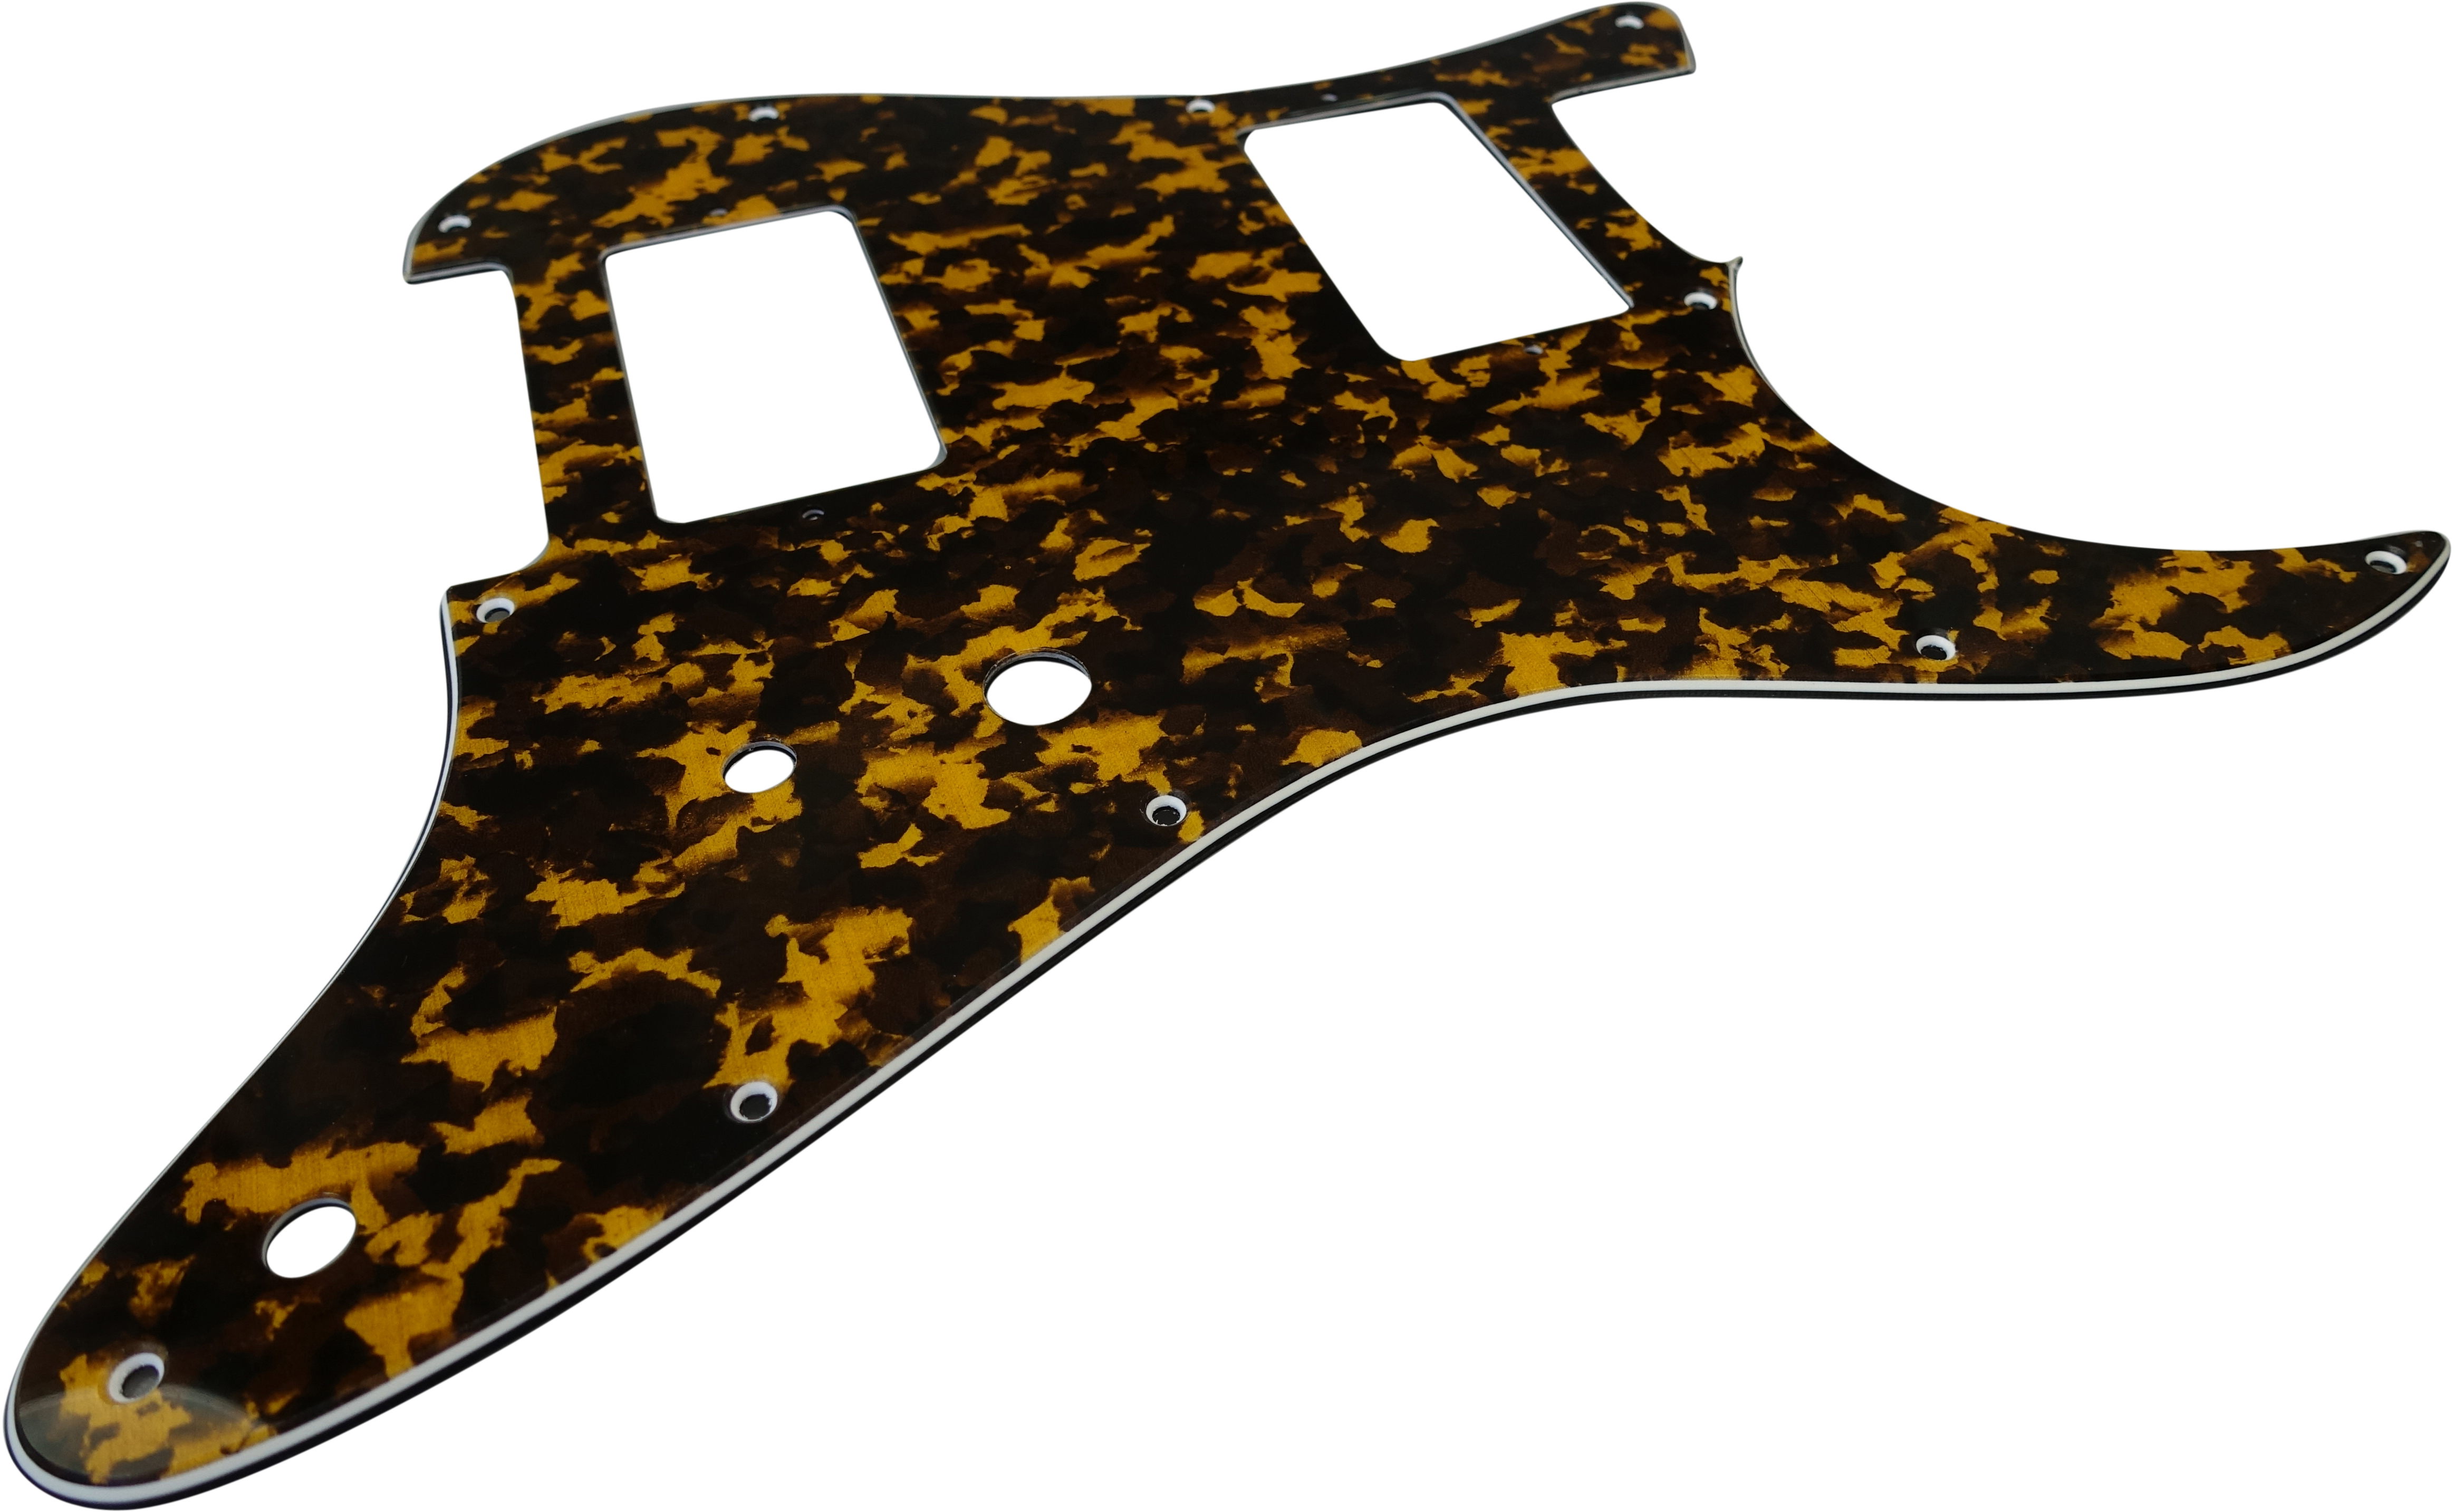 Toronzo Pickguard ST-HH-2PTS-3PLY-Tiger Yellow